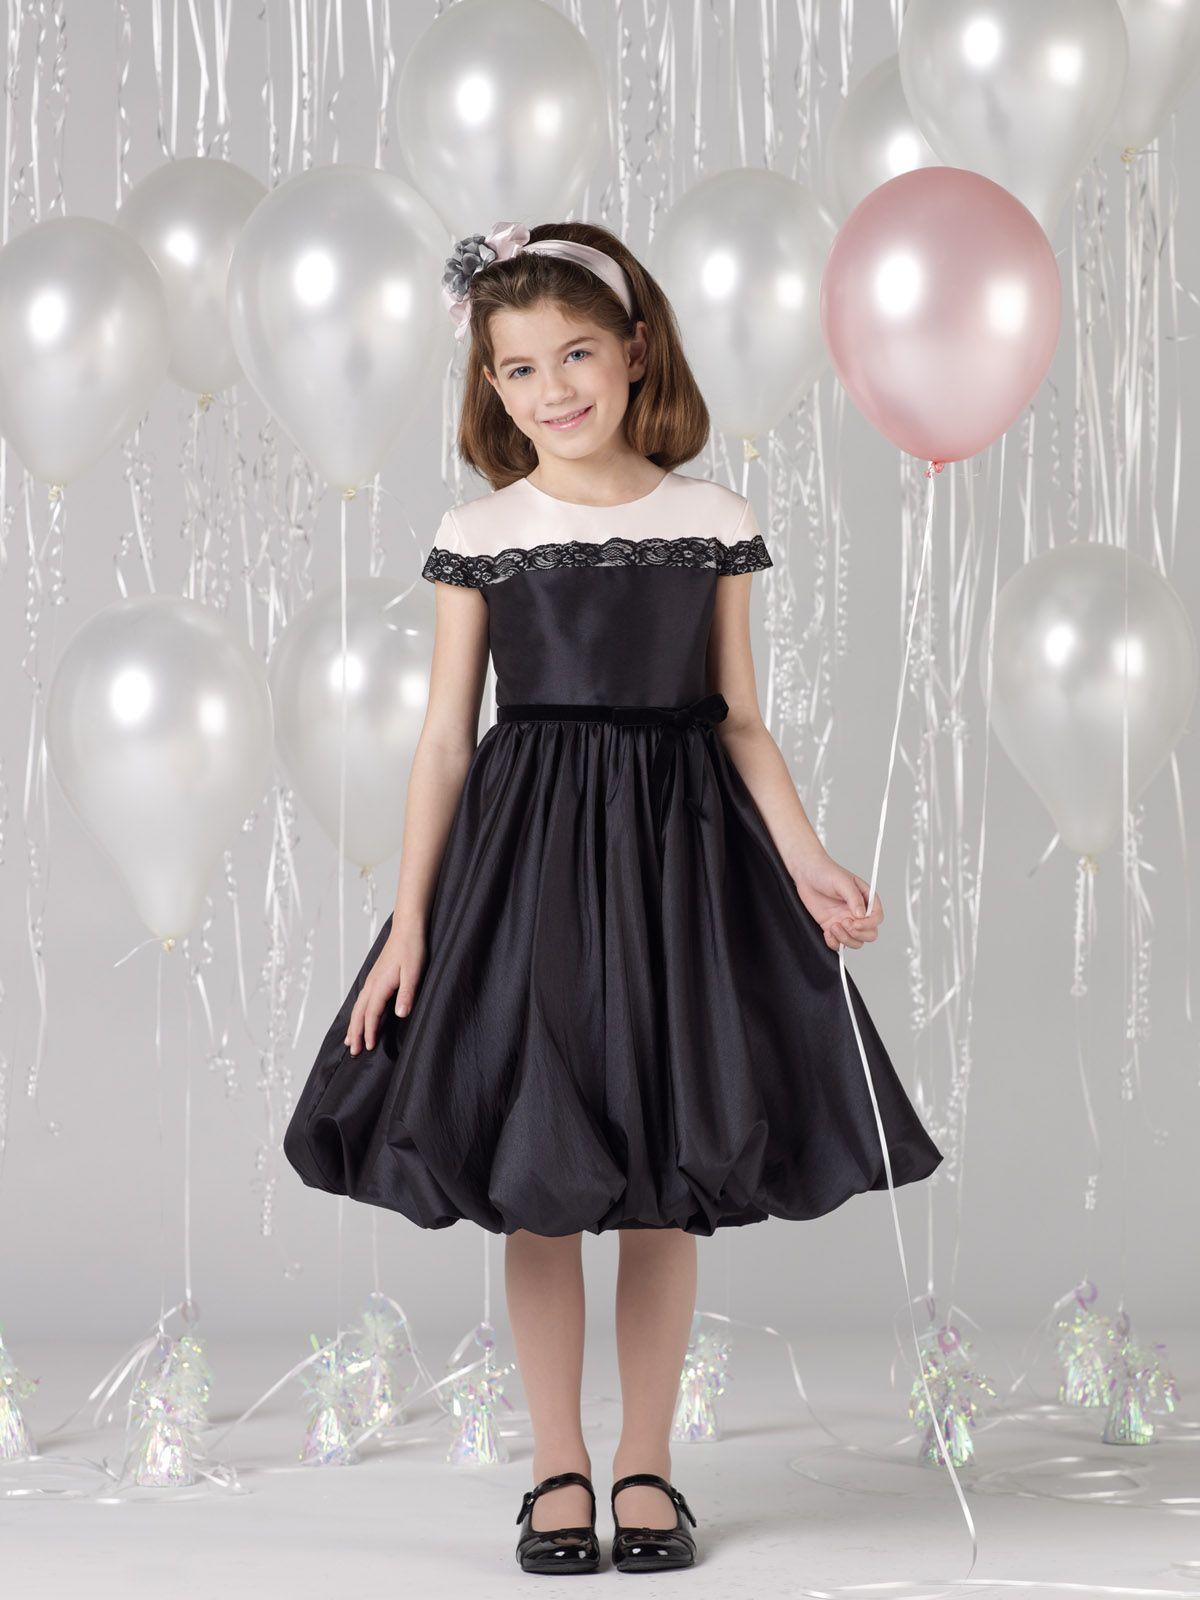 Joan calabrese sewwing pinterest girls dresses girls and